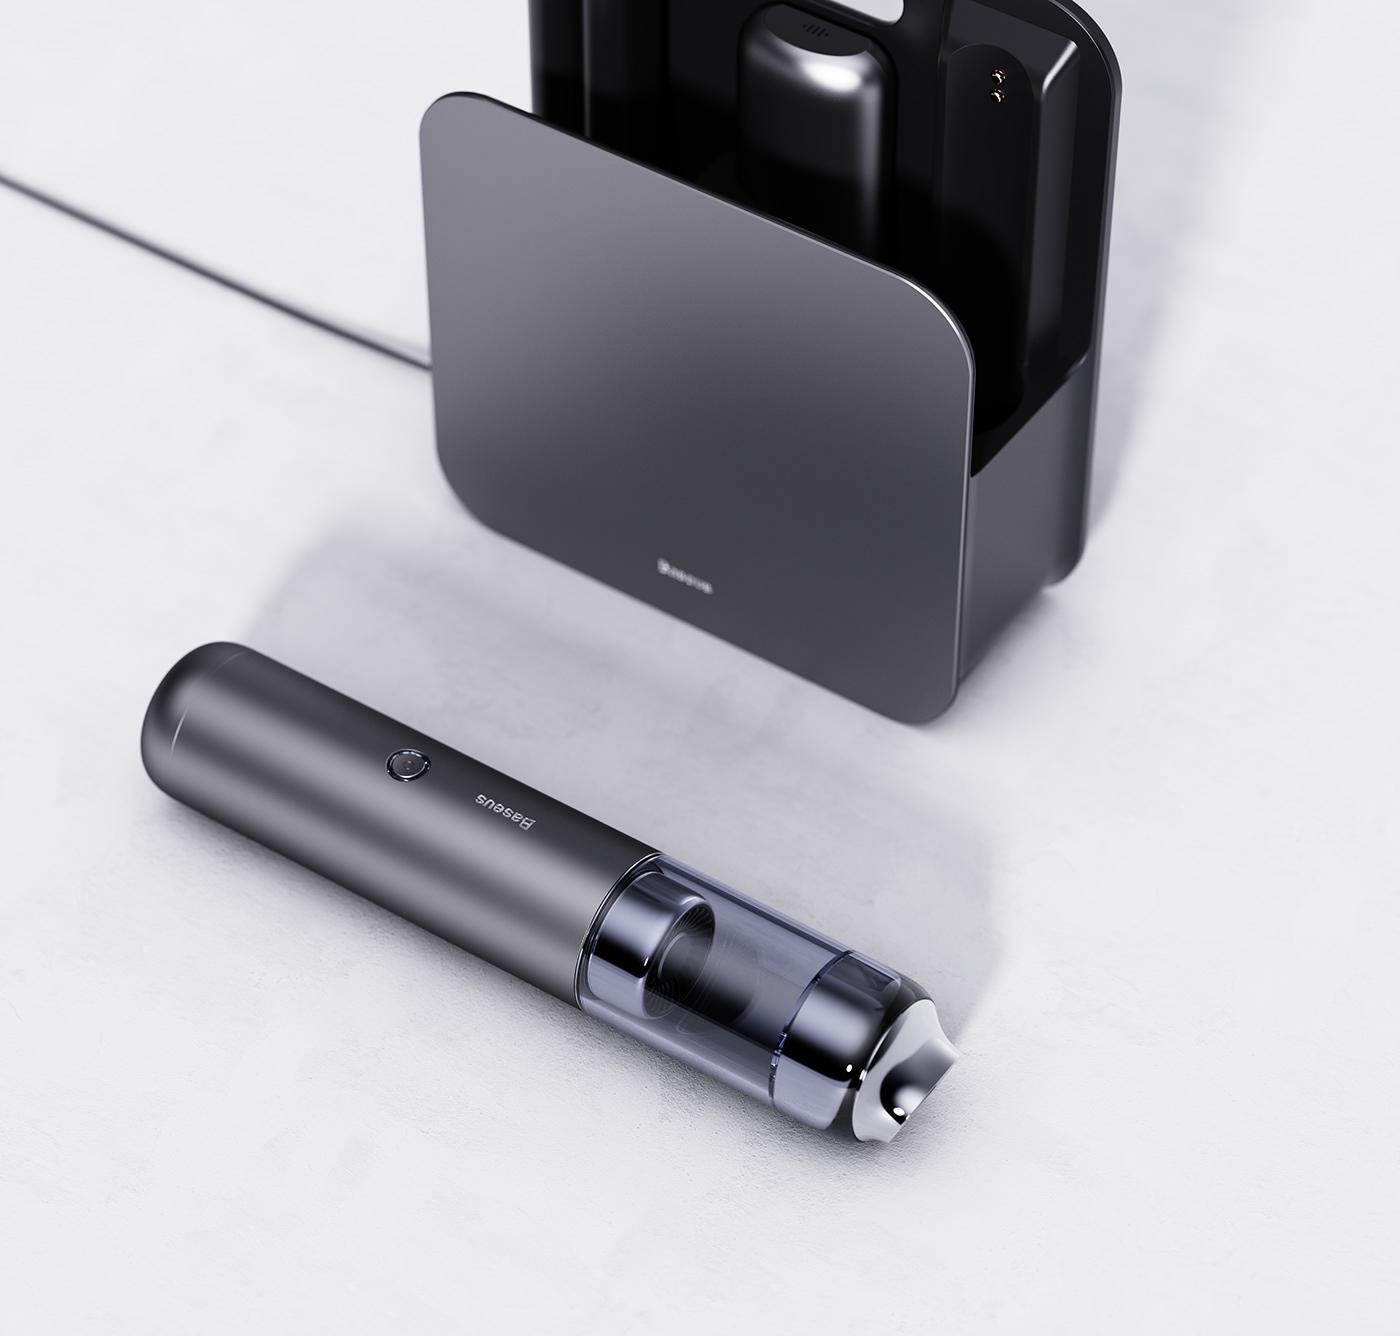 small appliance vacuum cleaner 吸尘器 小家电